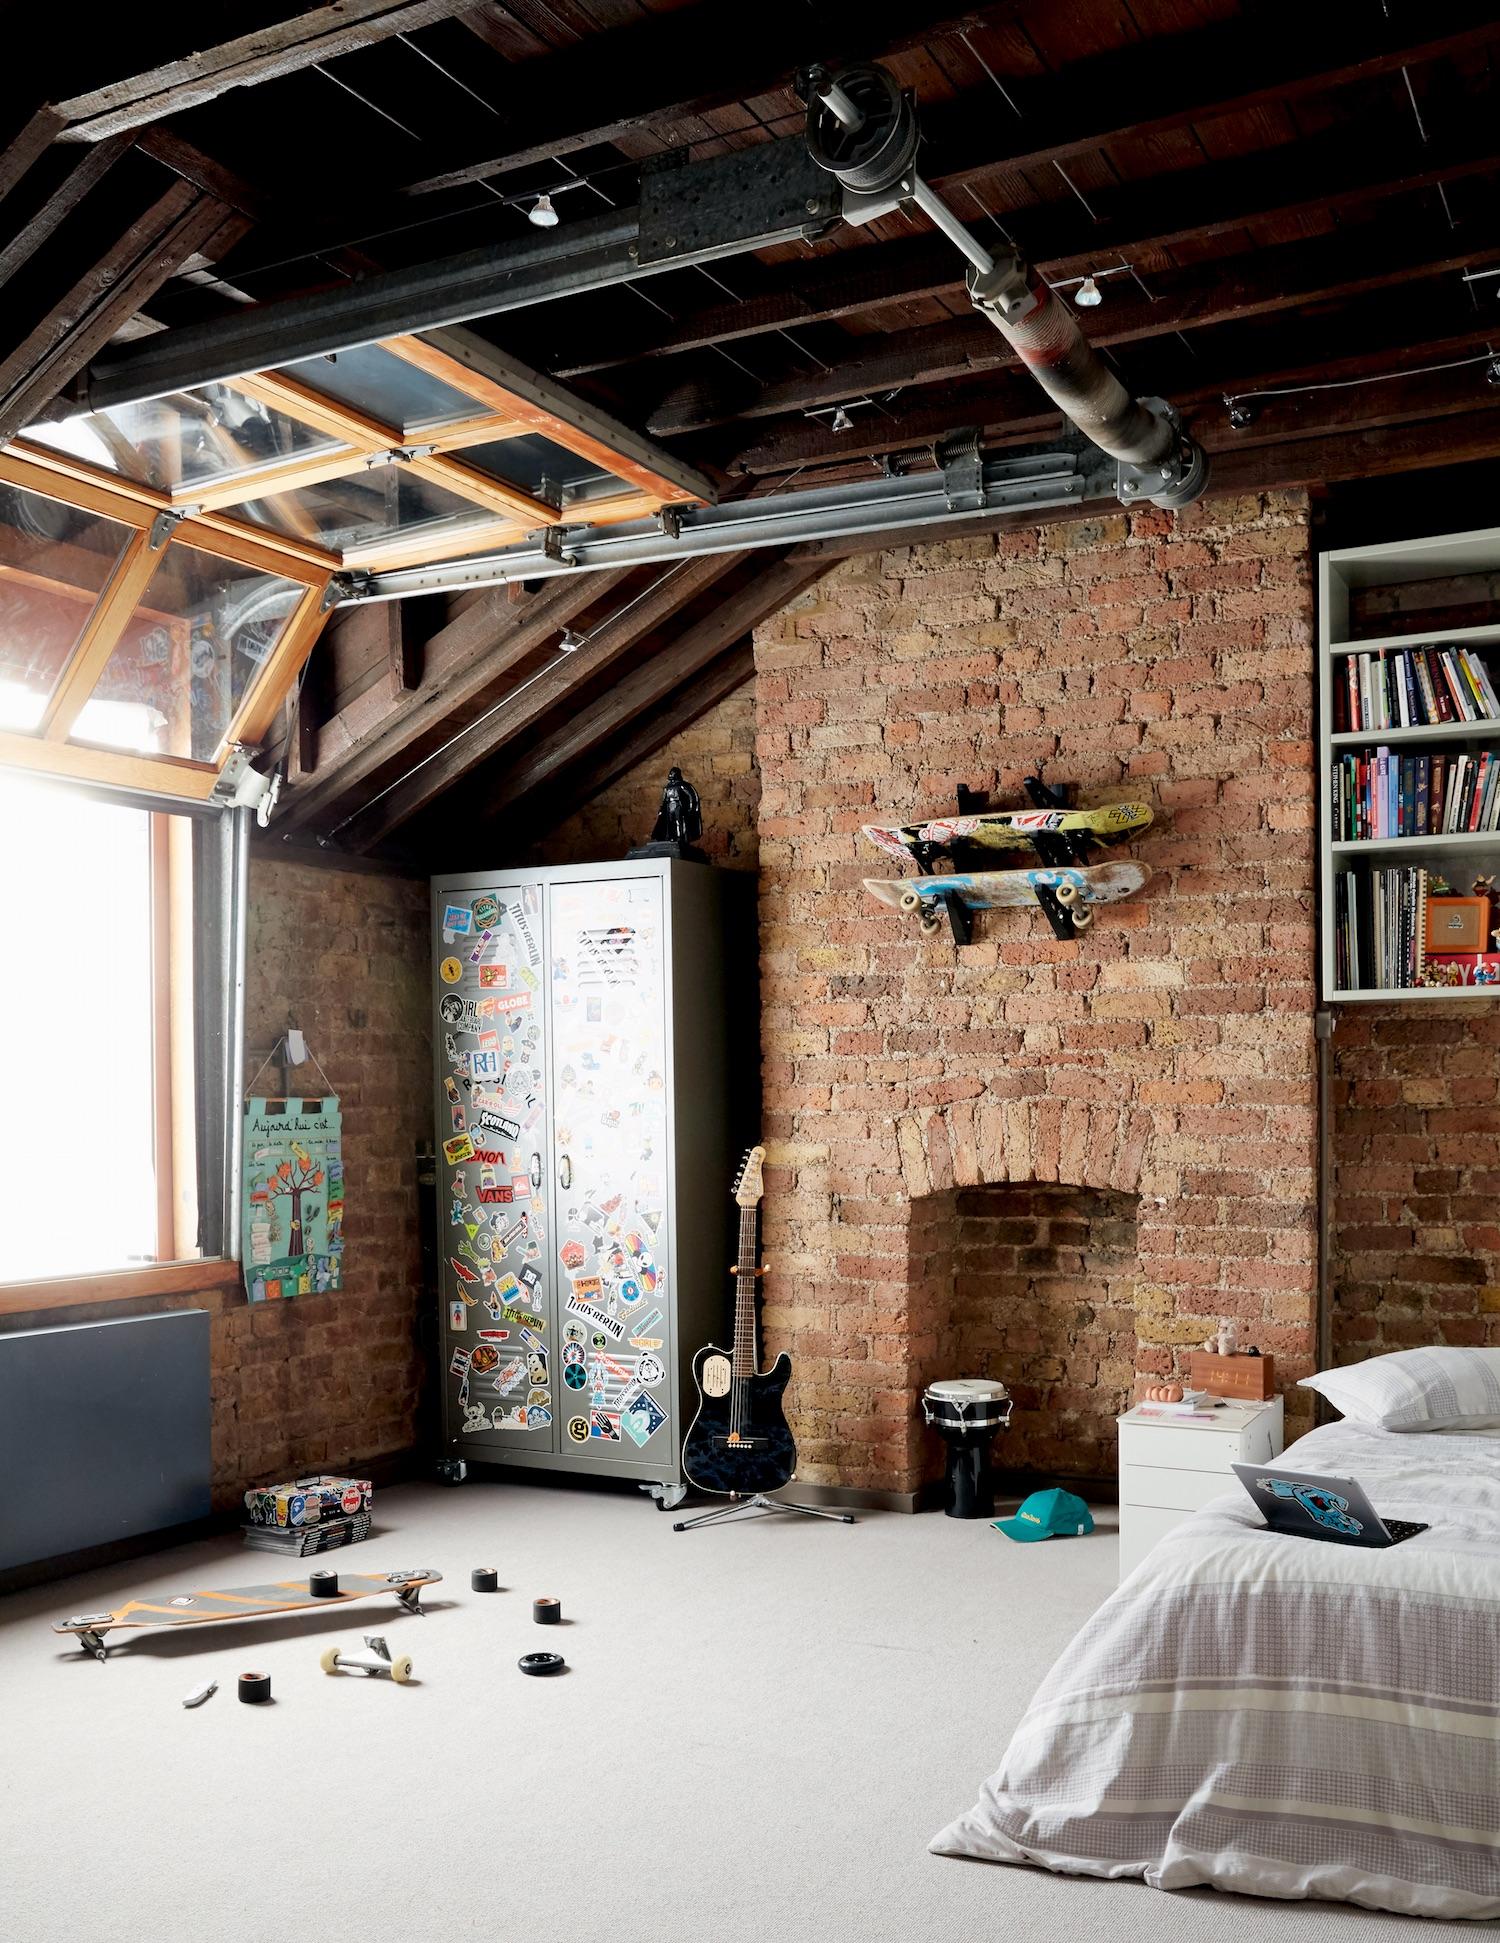 Porter Dining Room Set, 20 Cool Teenage Boy Bedroom Ideas To Inspire A Fresh New Look Livingetc Livingetcdocument Documenttype